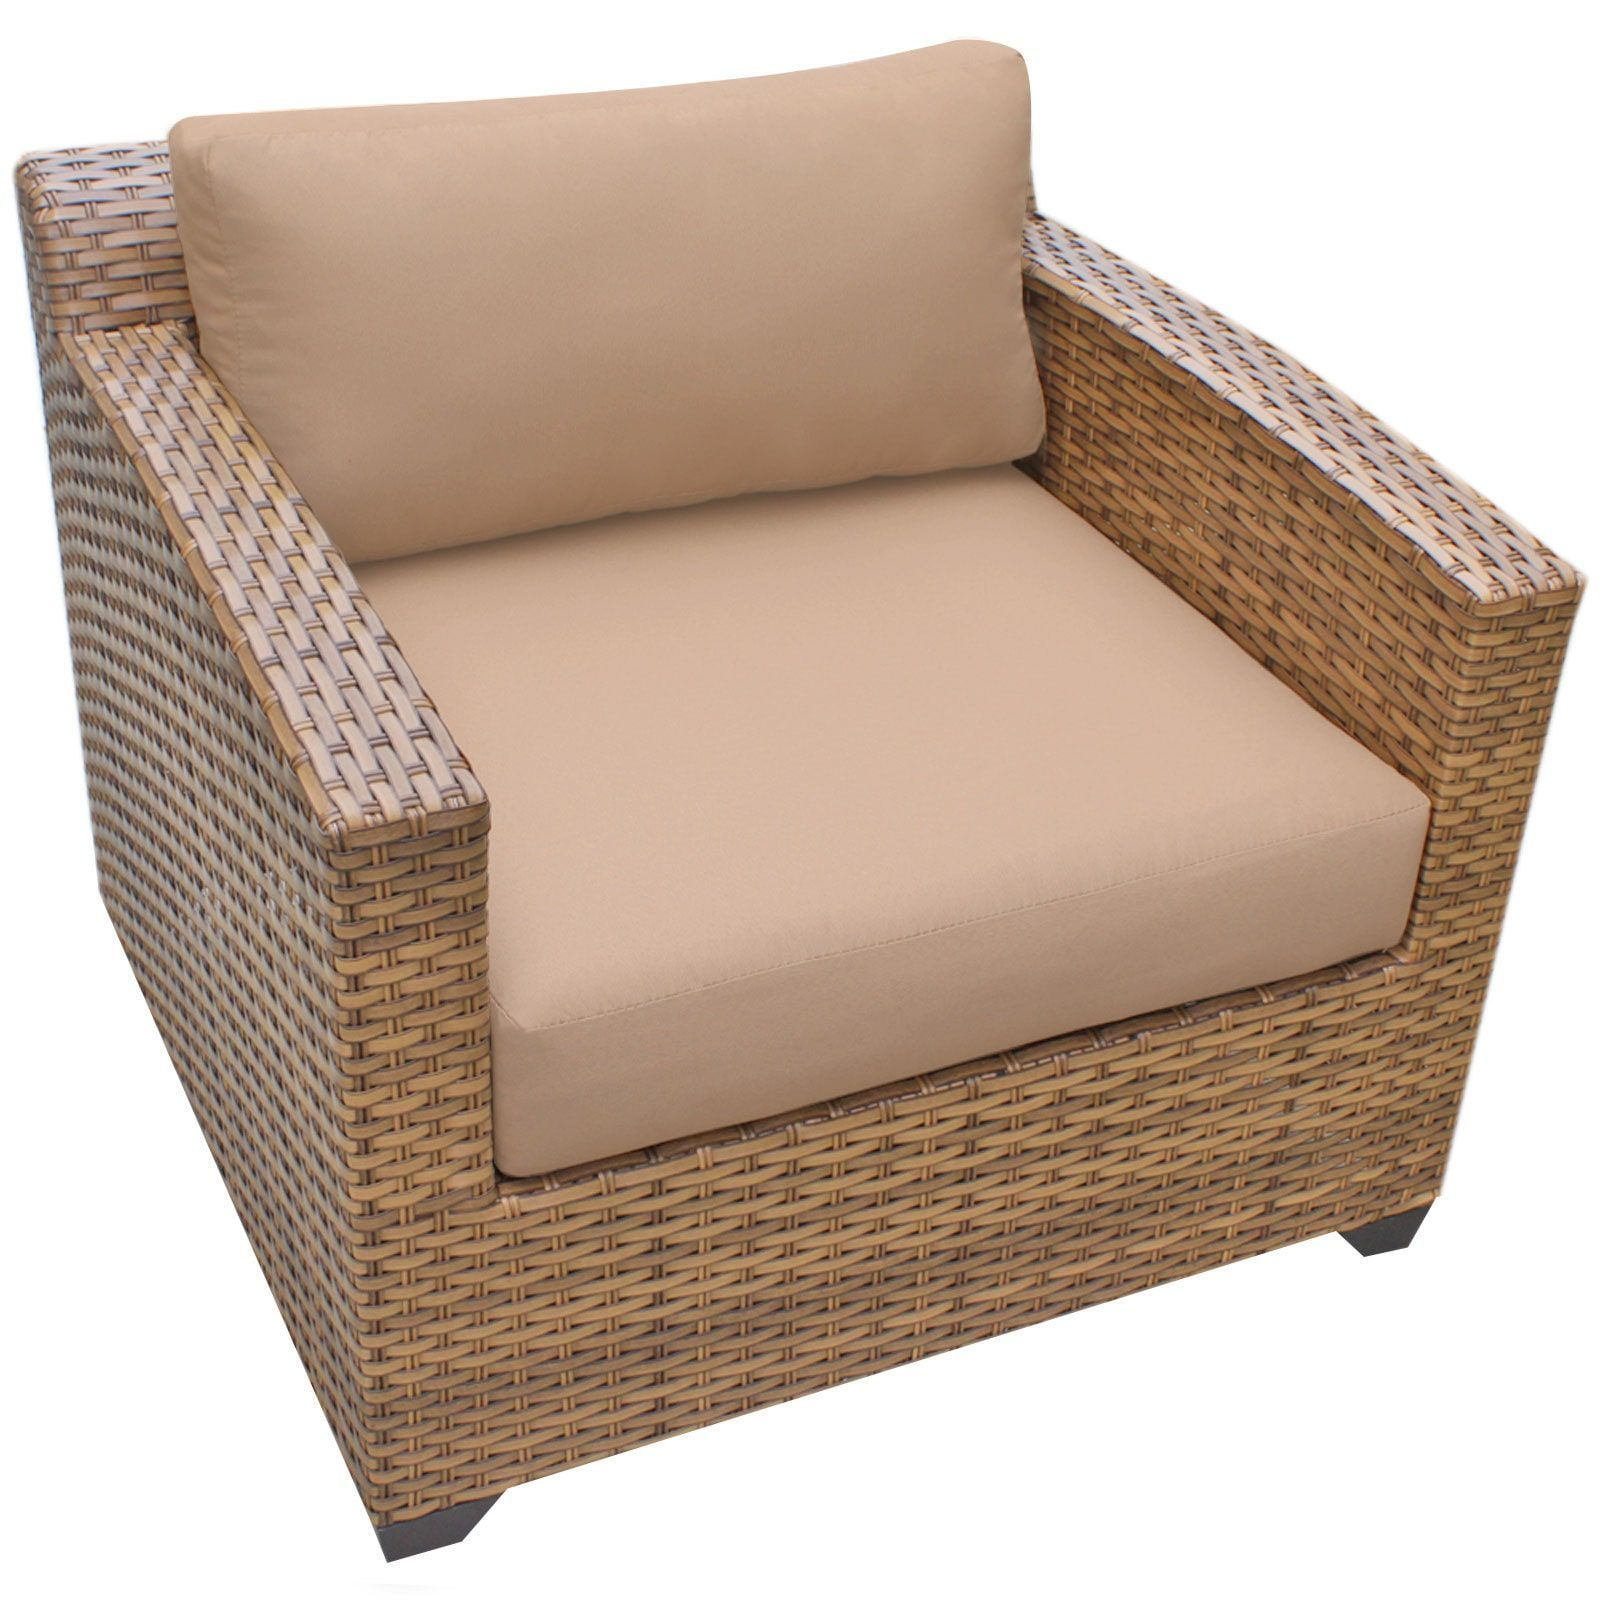 Outdoor Home Bayou Wicker Outdoor Patio Club Chair , Patio Furniture